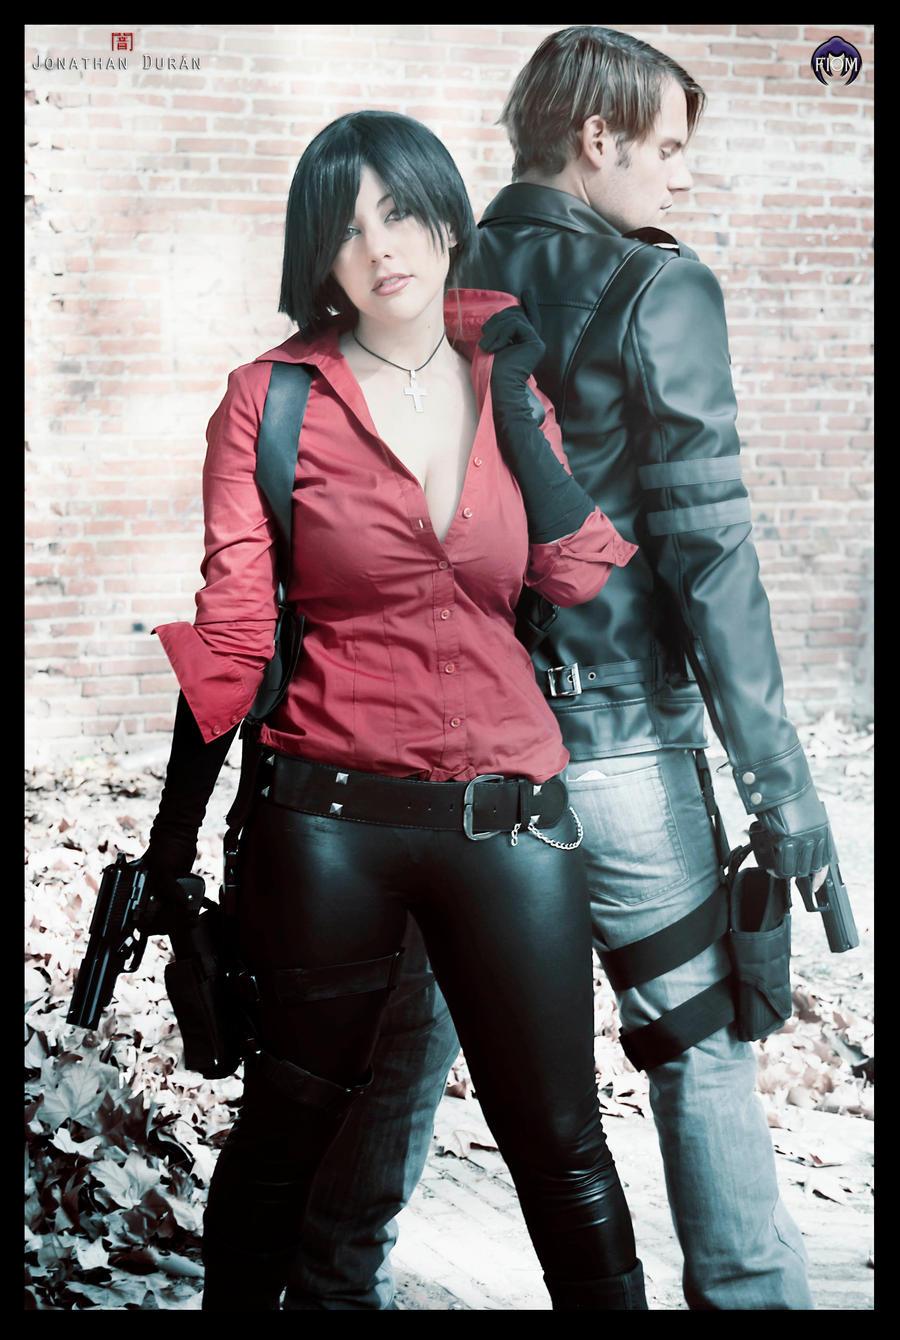 Leon and Ada resident evil 6 by JonathanDuran